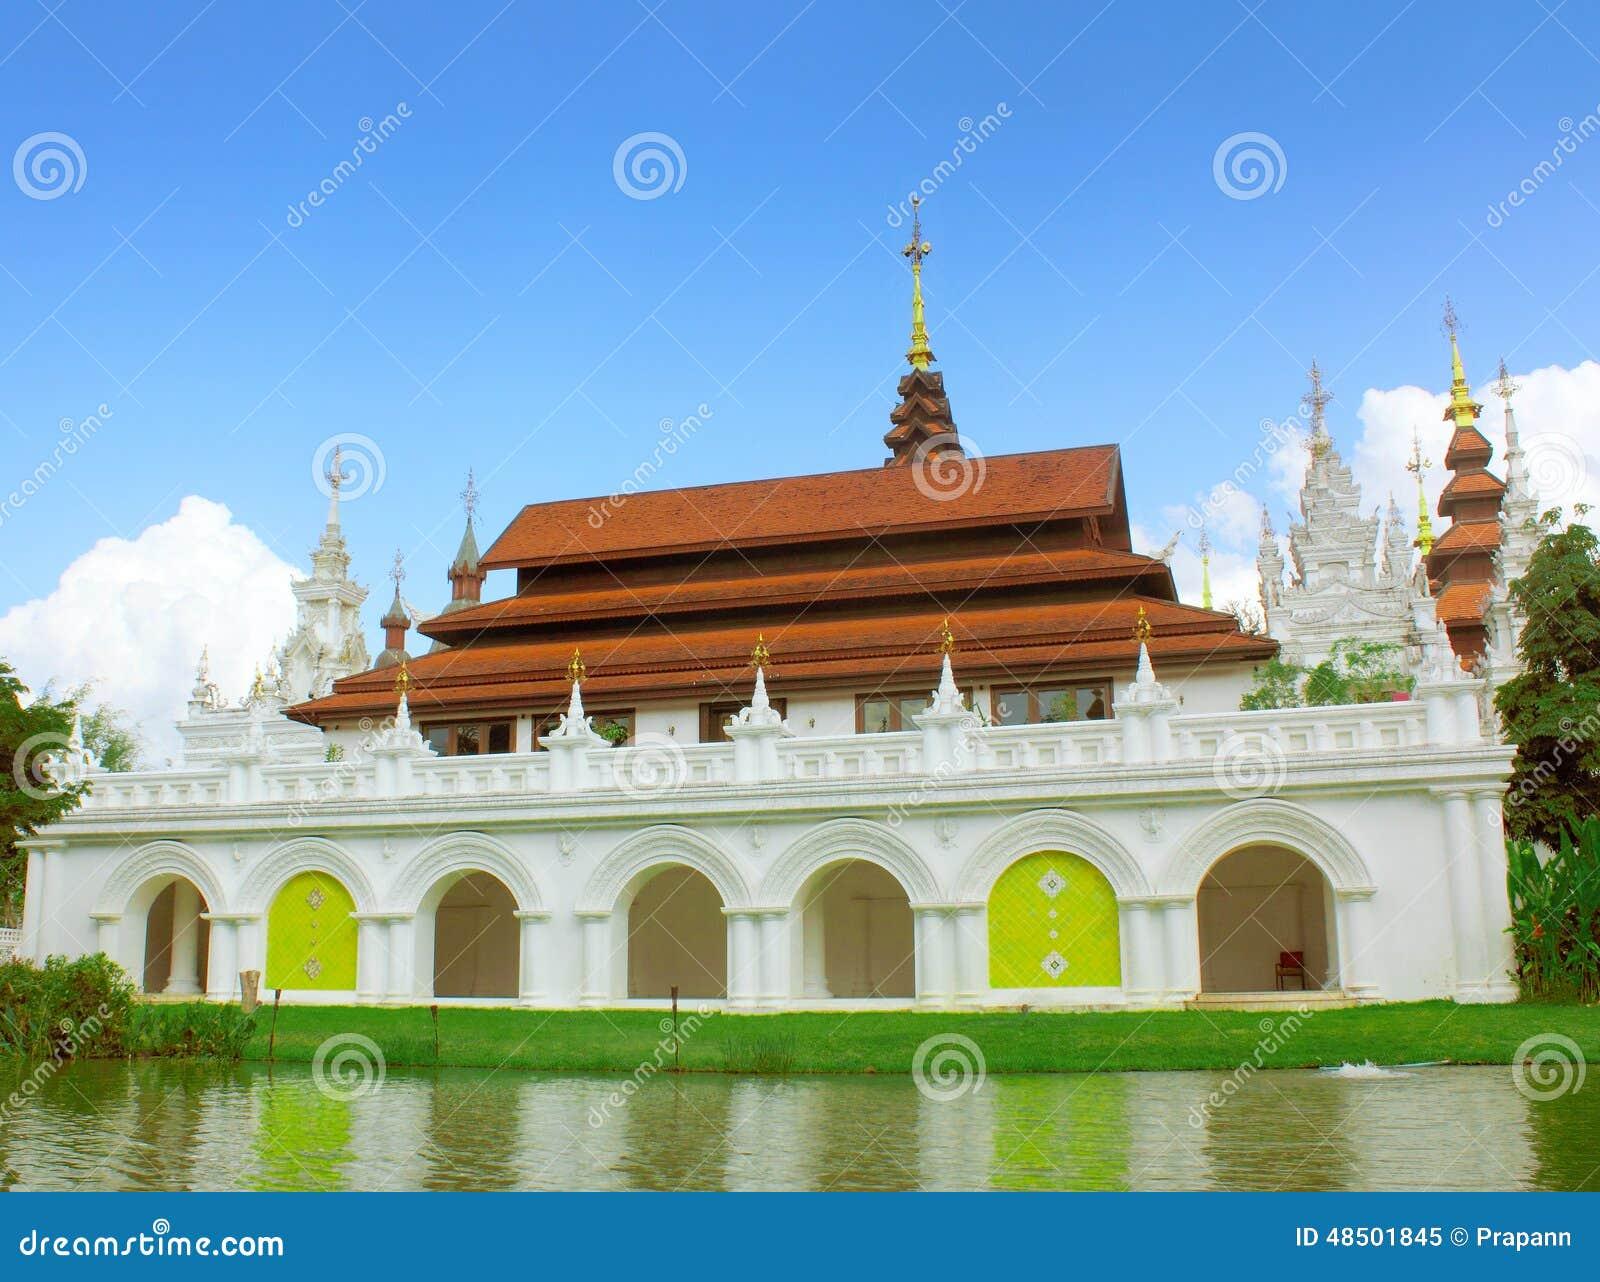 Oriental style buildings